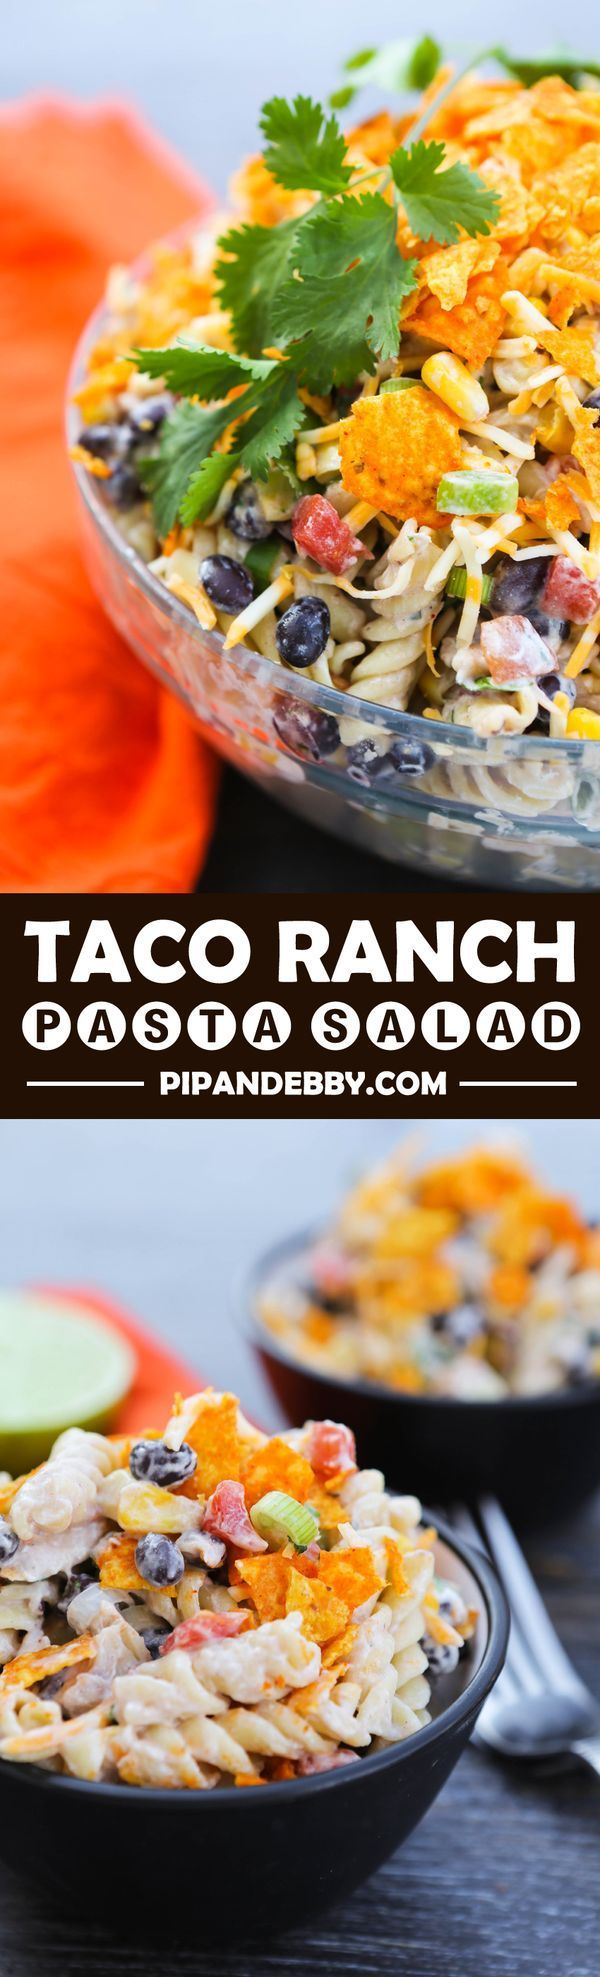 Taco Ranch Pasta Salad Recipe - a great idea for a BBQ party!